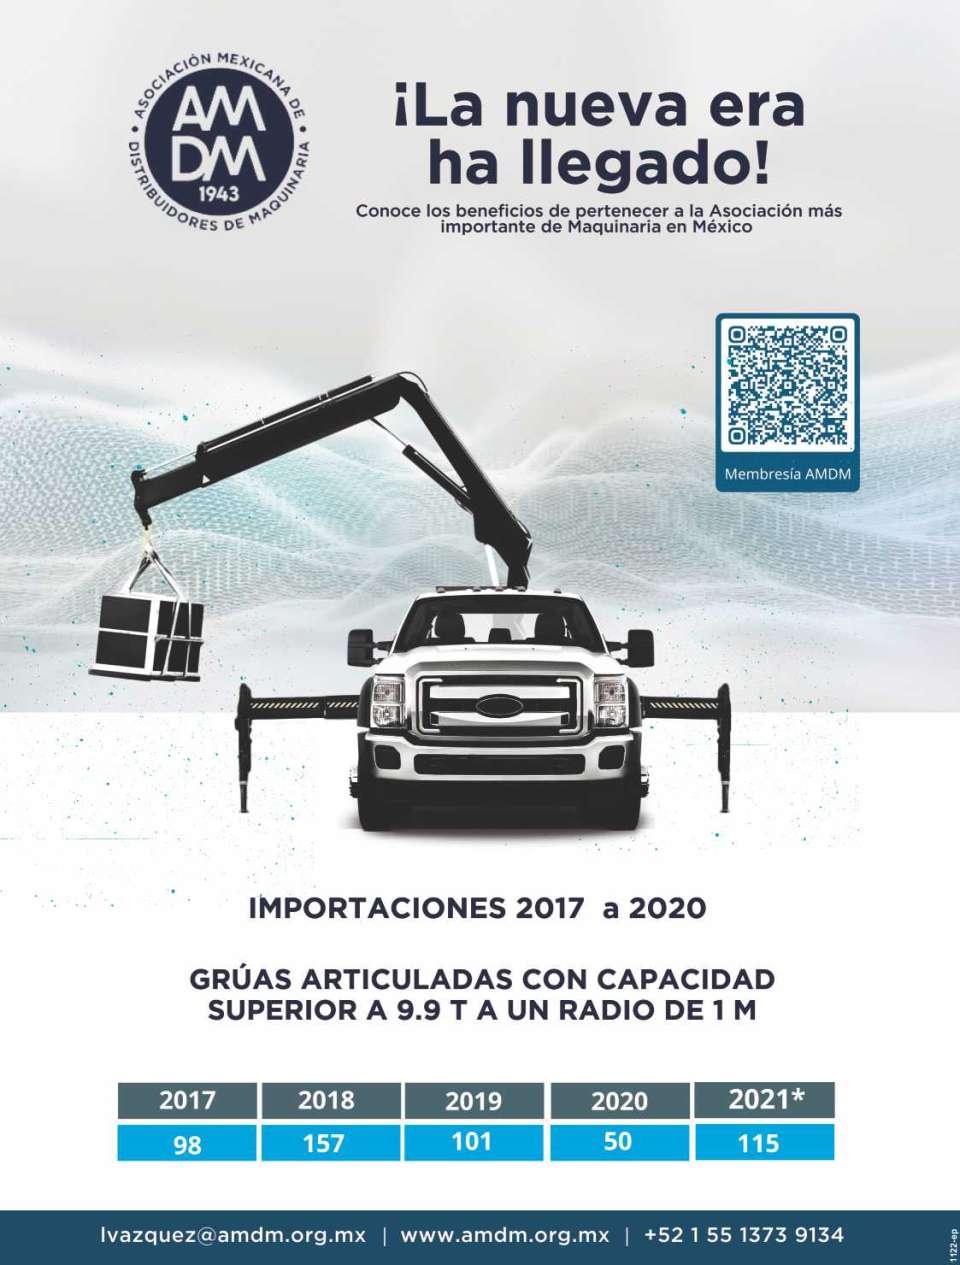 AMDM - Mexican Association of Machinery Distributors